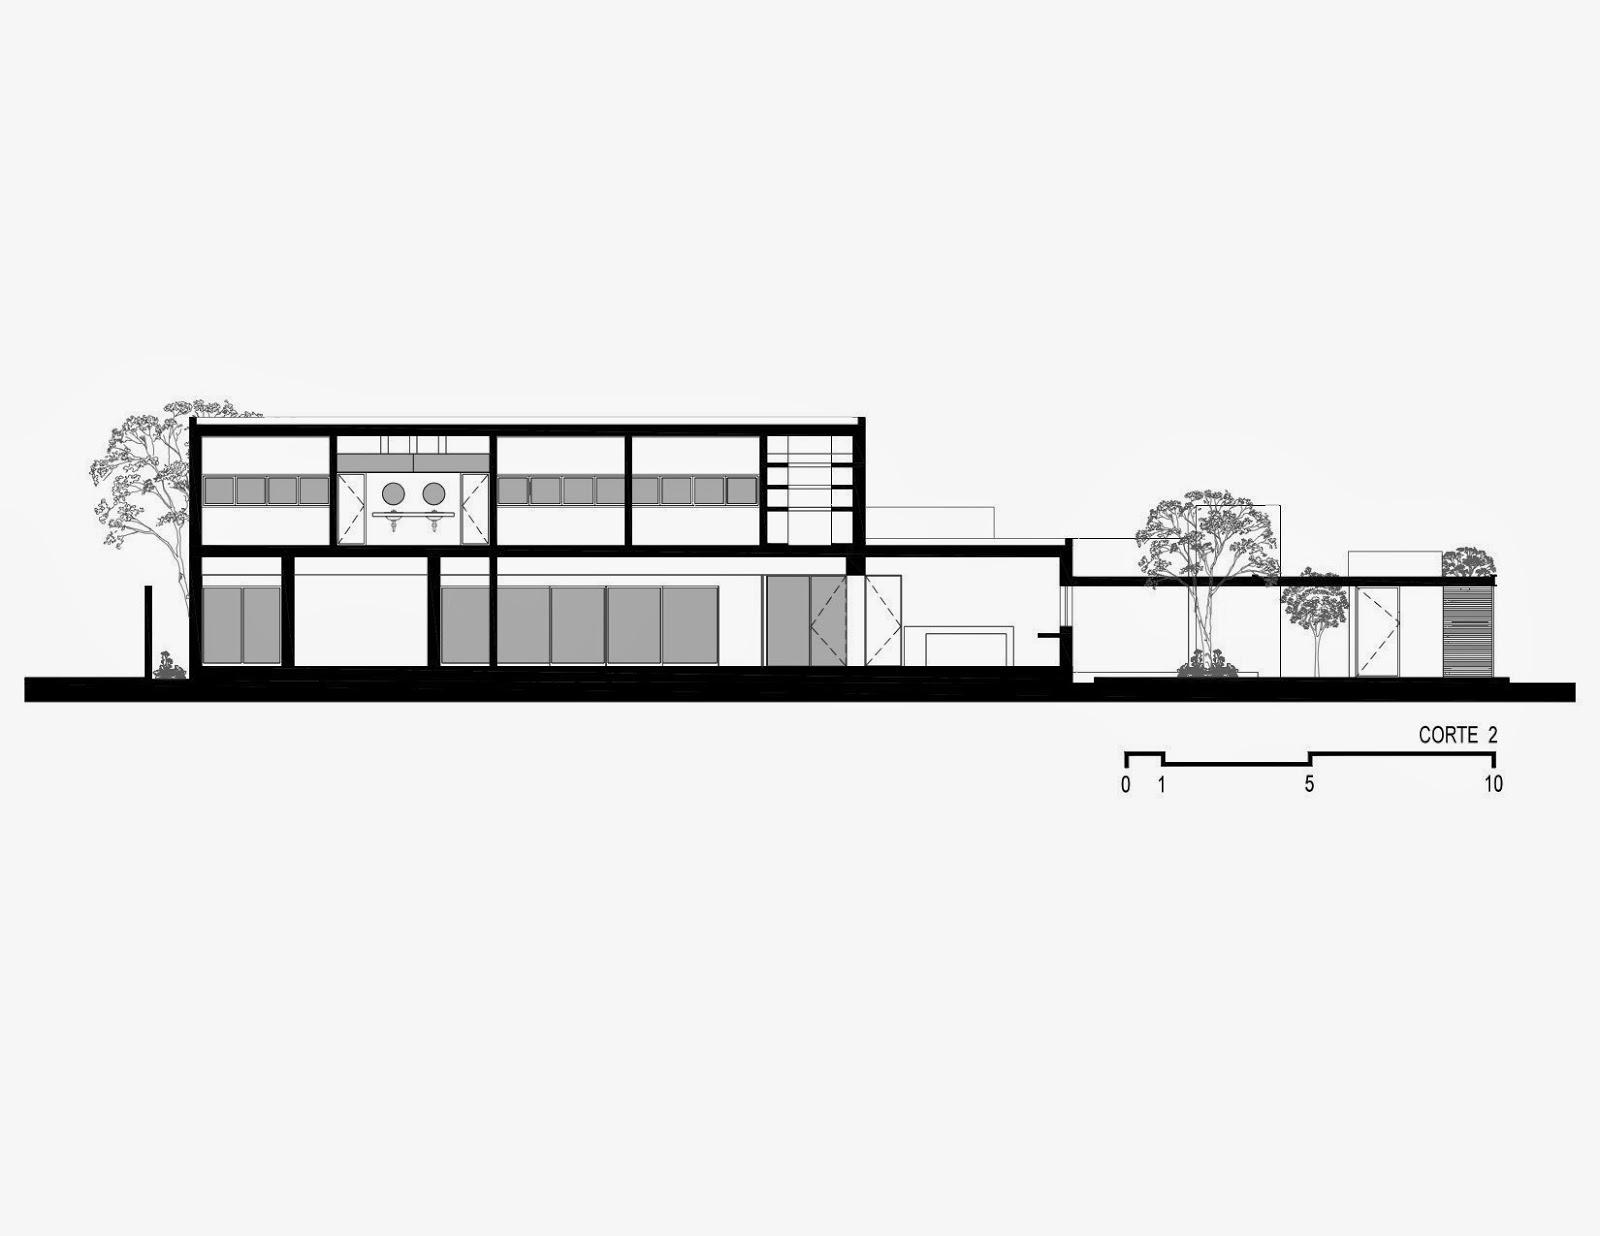 Apuntes revista digital de arquitectura proyecto for Cortes arquitectonicos